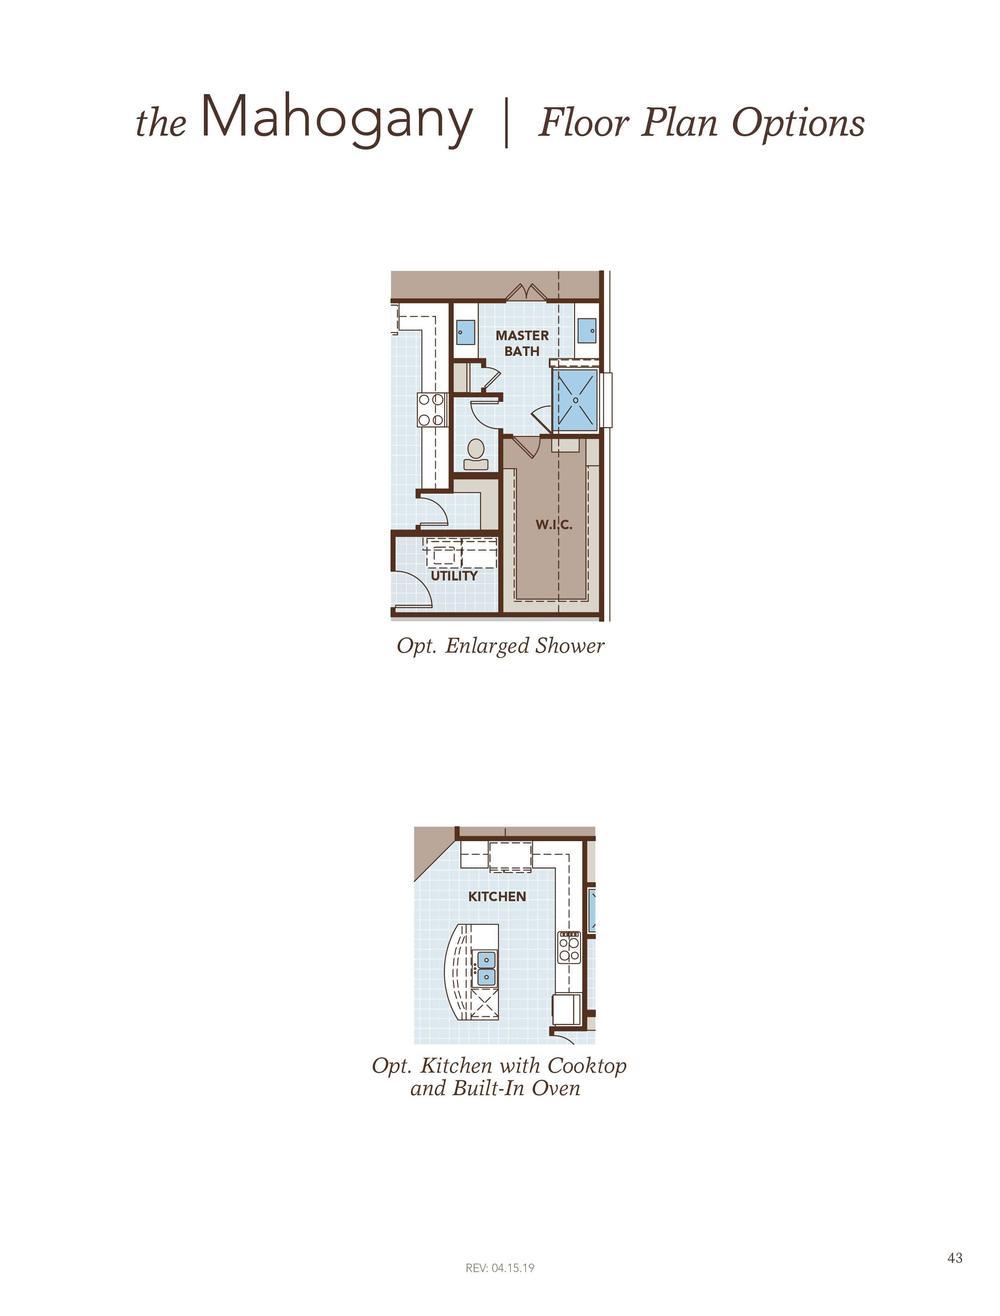 Mahogany Floor Plan Options